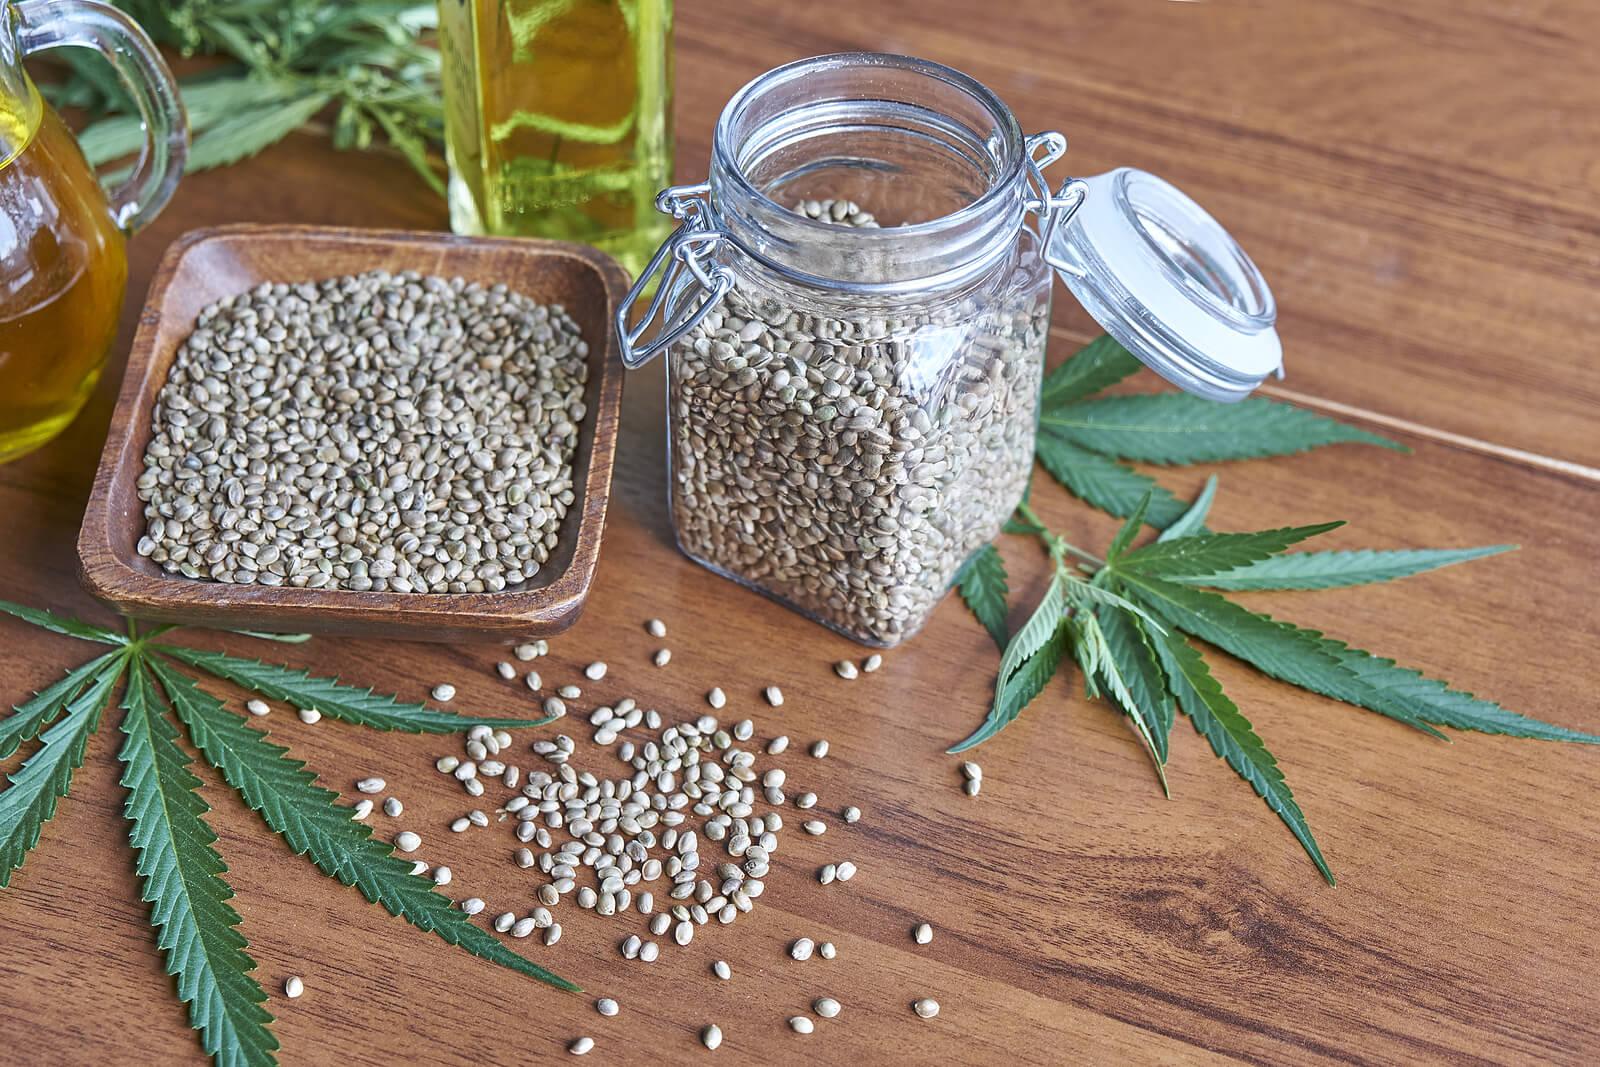 Buy Marijuana Seeds In Branson